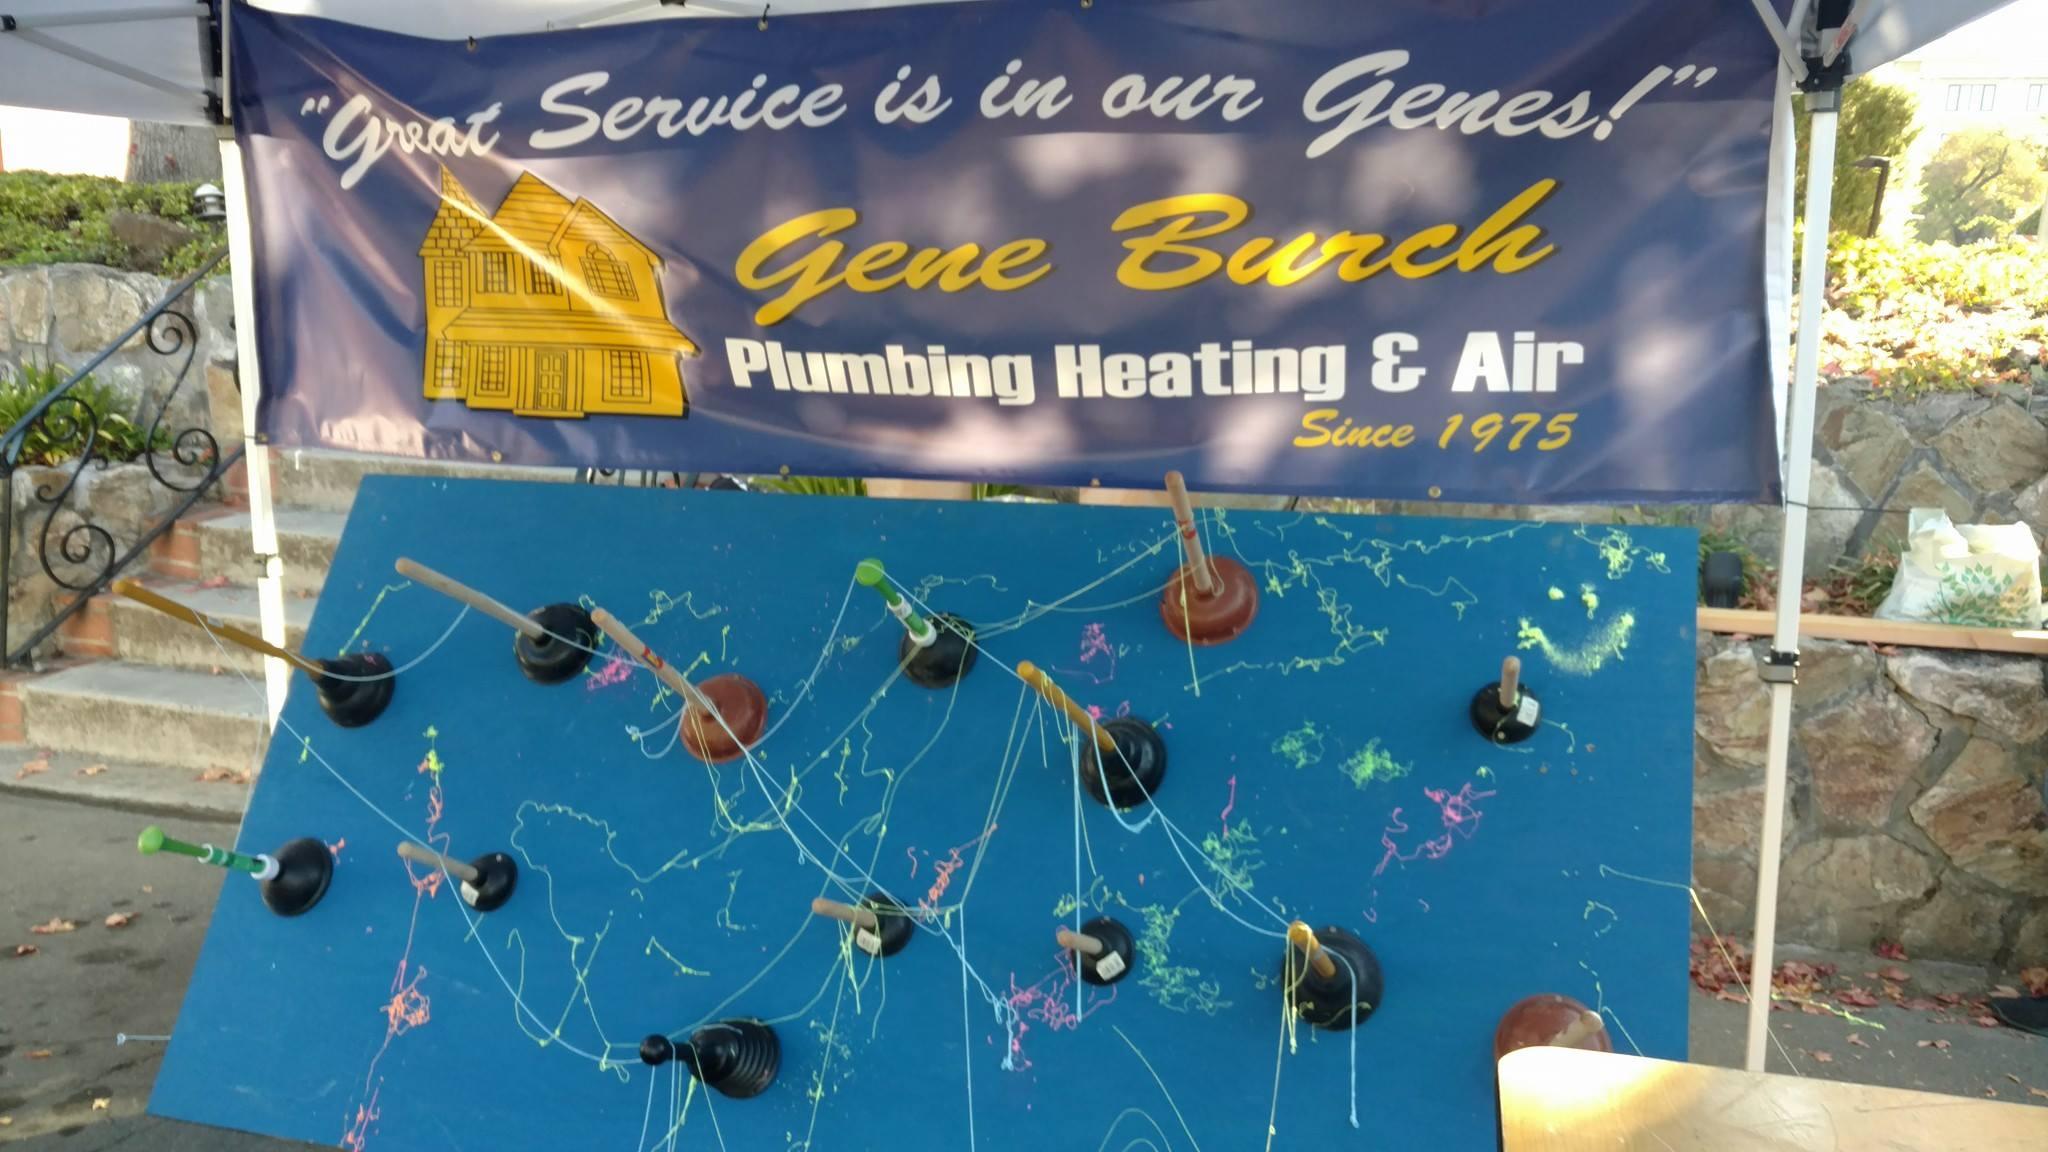 Scream on the Green Gene Burch Plumming